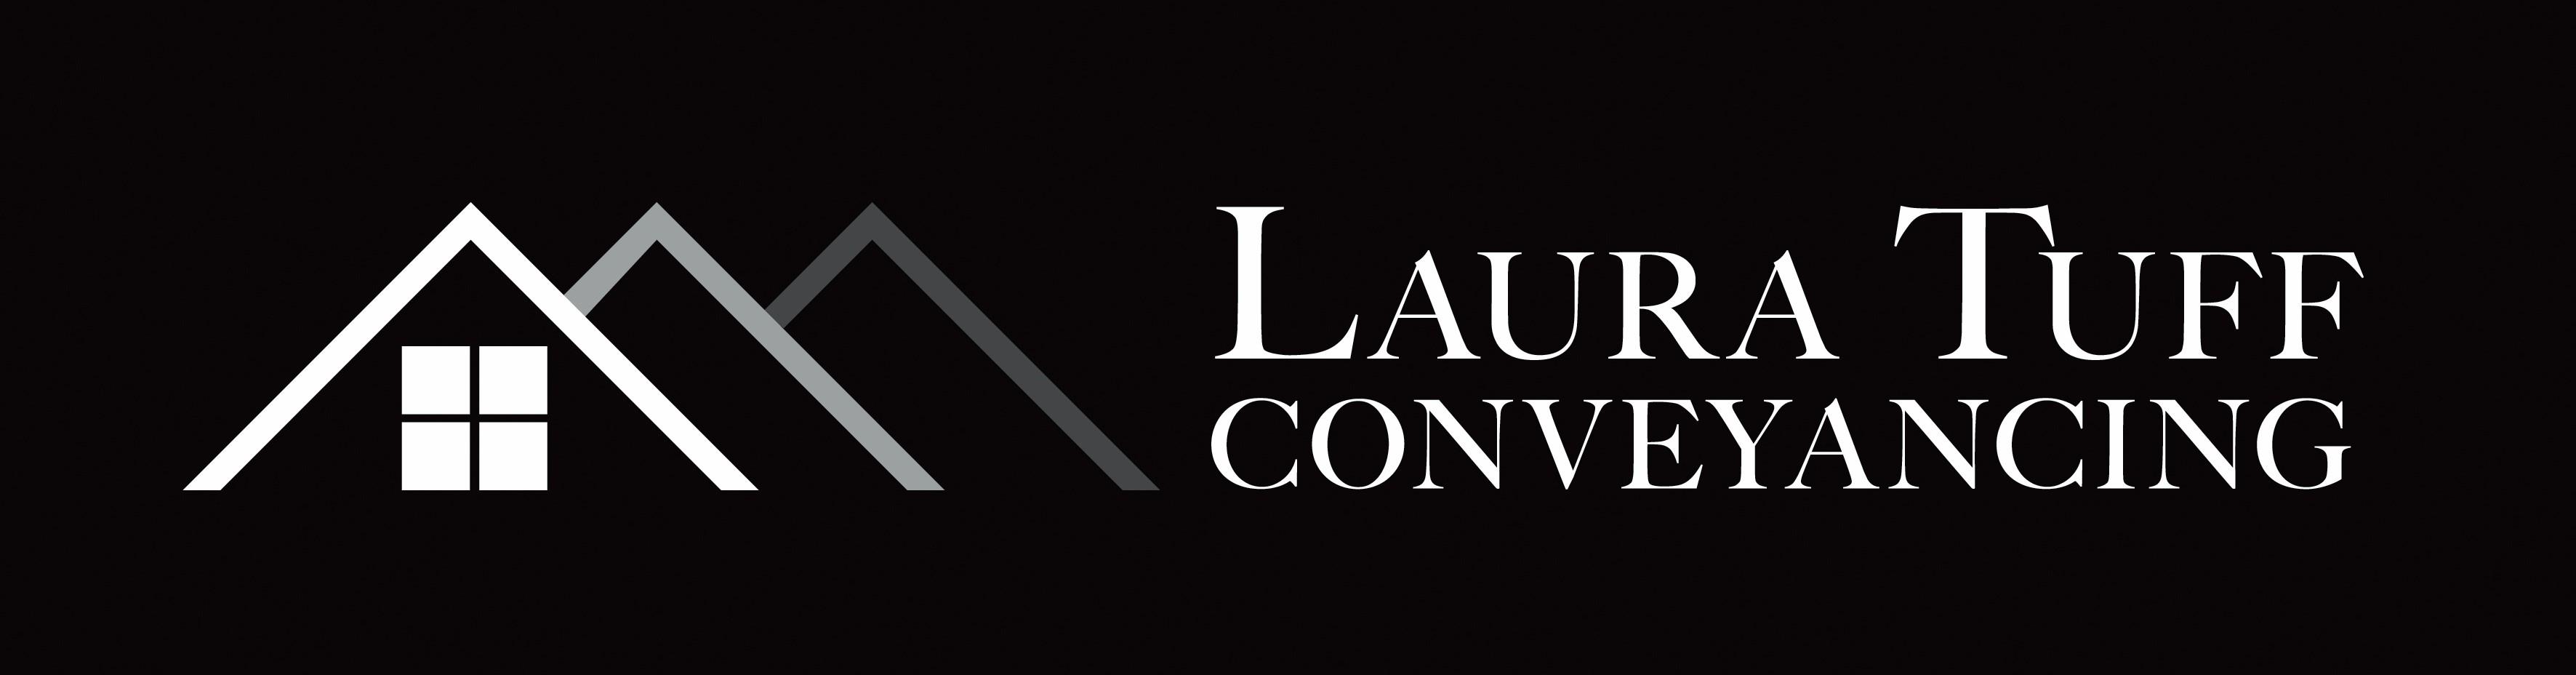 Laura Tuff Conveyancing